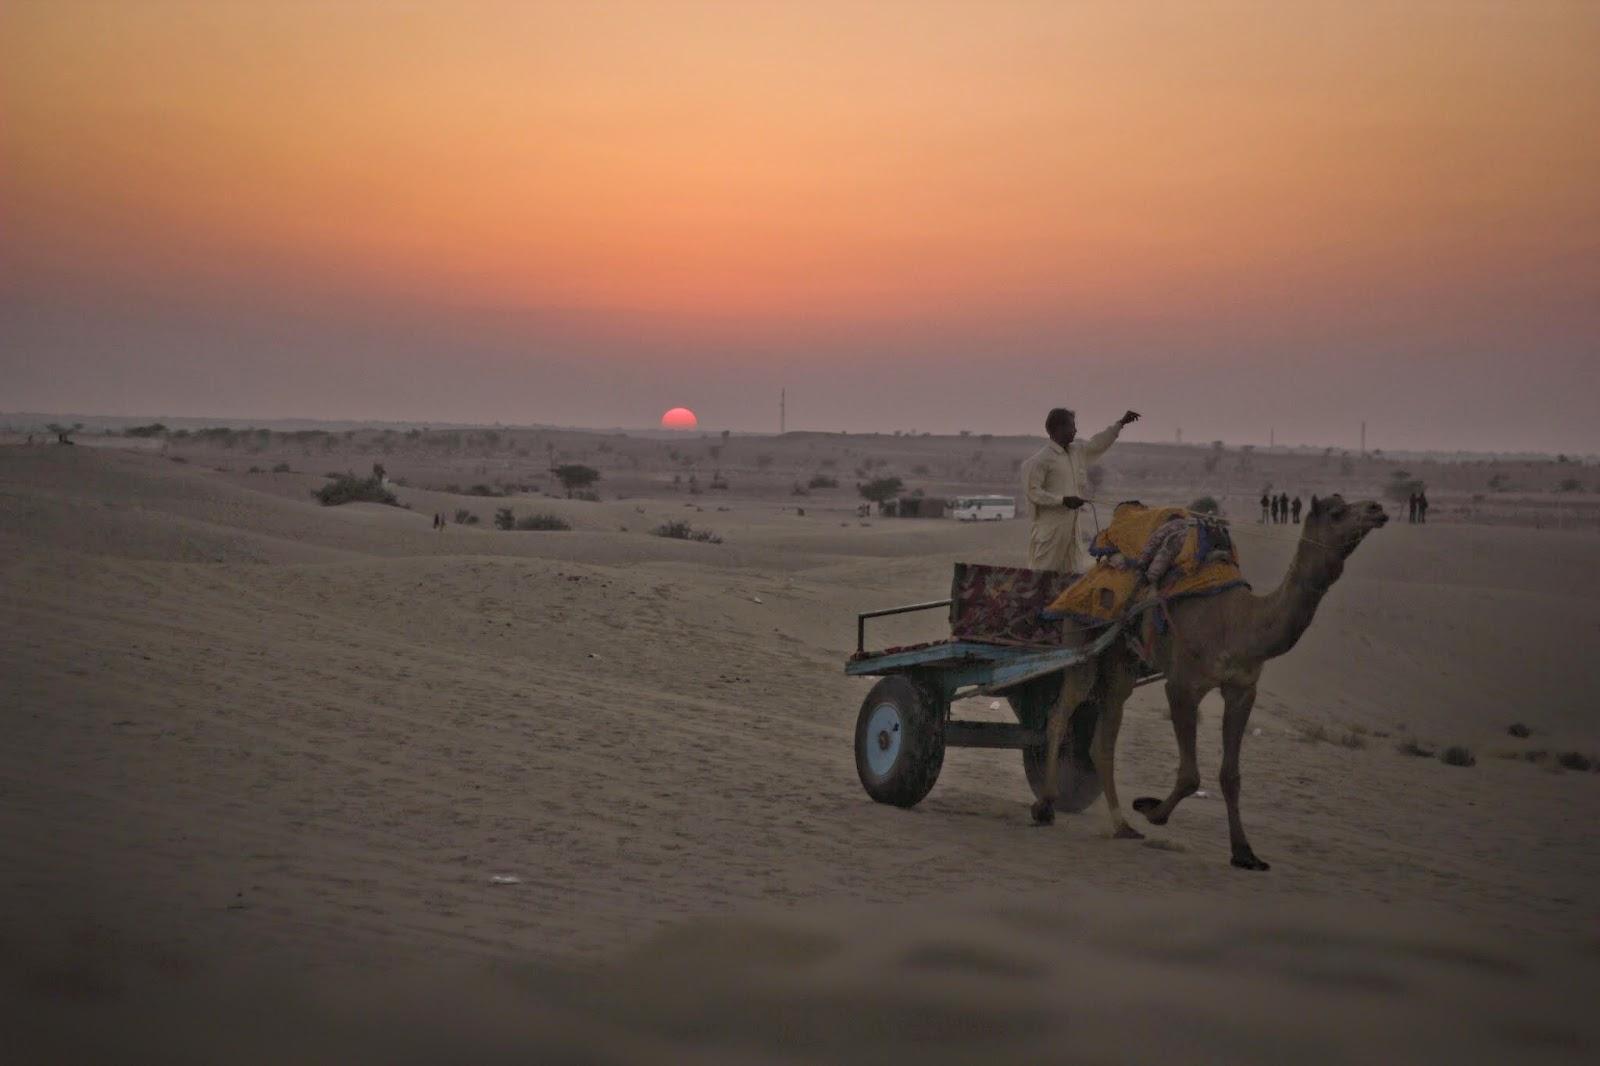 A man driving a camel cart at the Sam Sand dunes, Jaisalmer